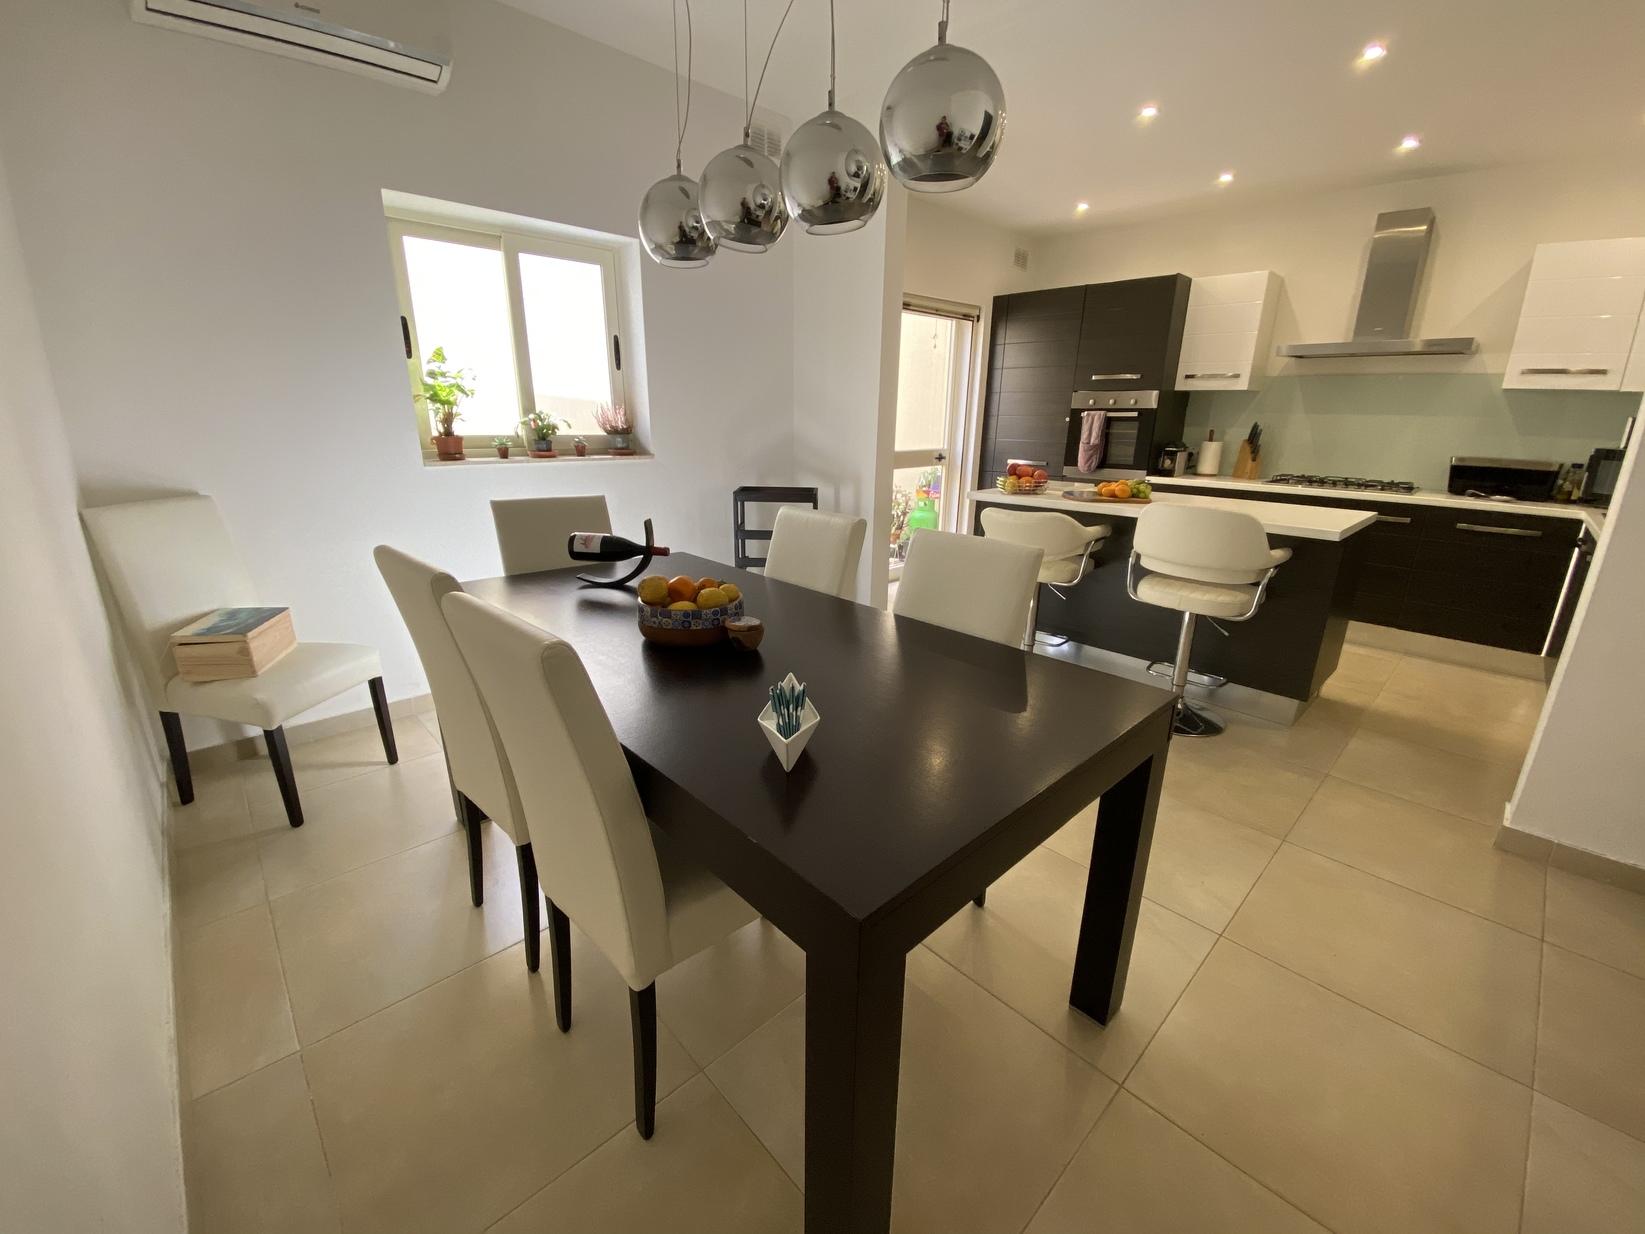 3 bed Terraced House For Sale in Balzan, Balzan - thumb 4